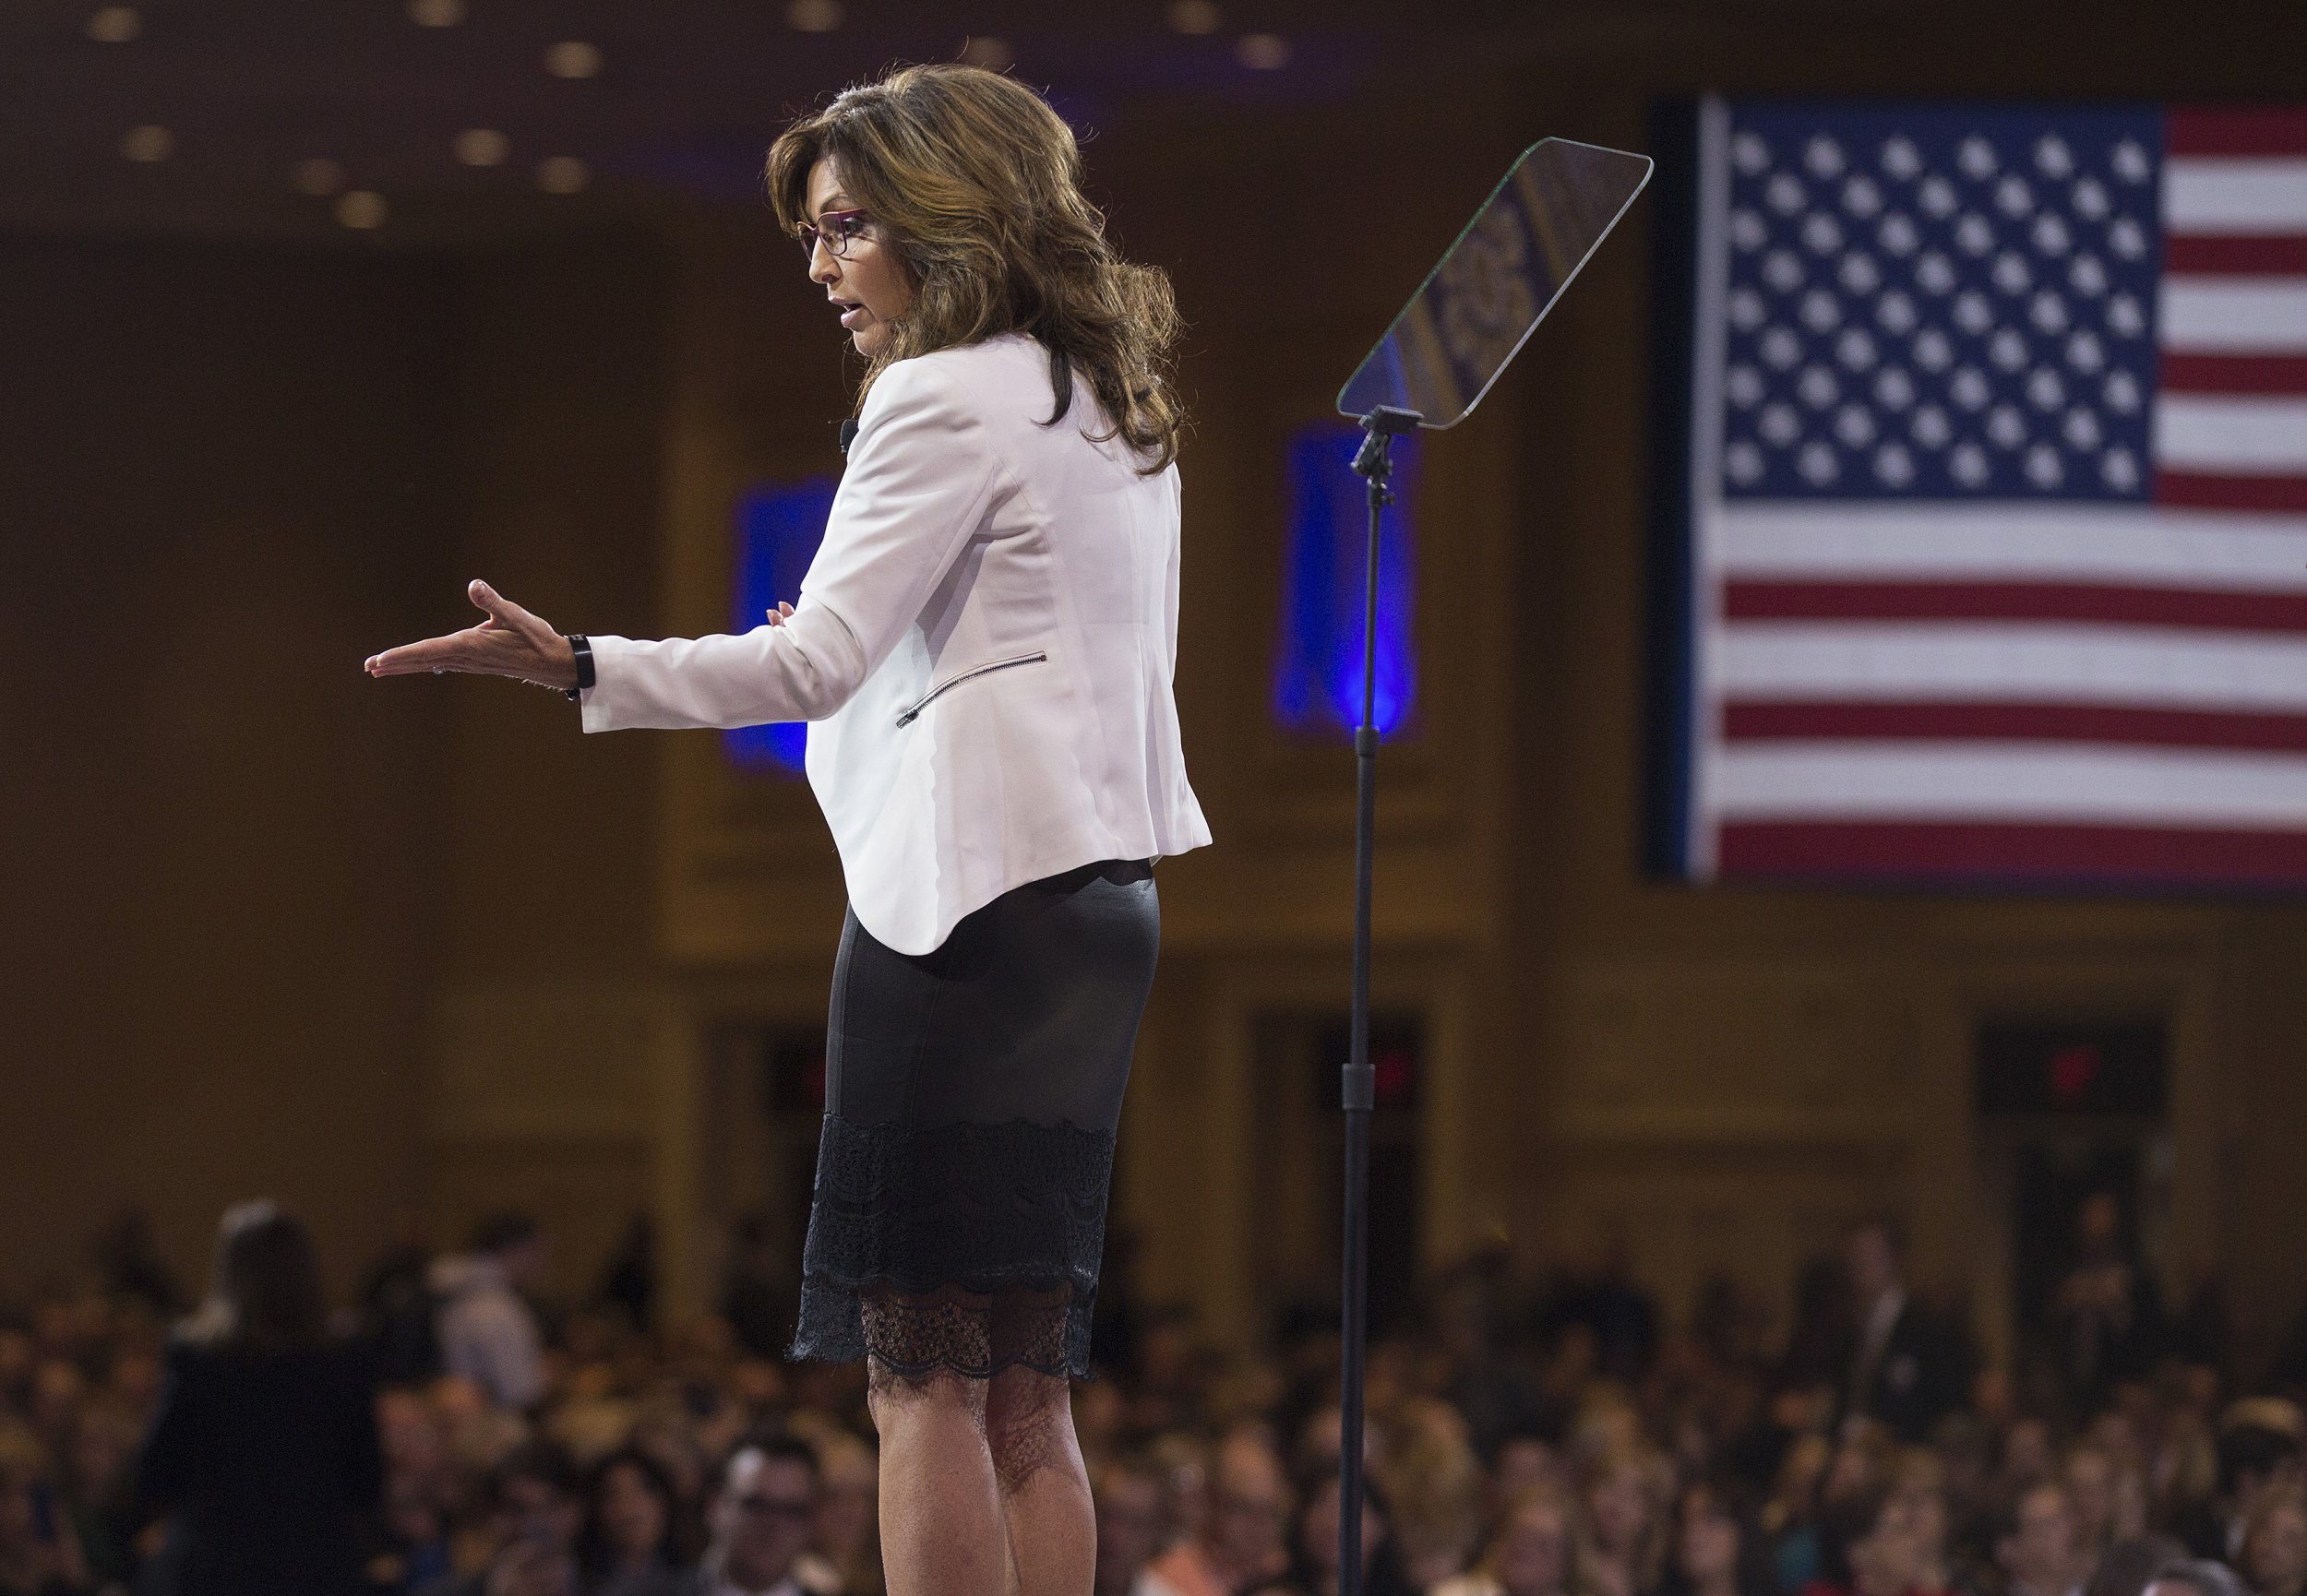 Sarah Palin Says Immigrants to U.S. Should 'Speak American'